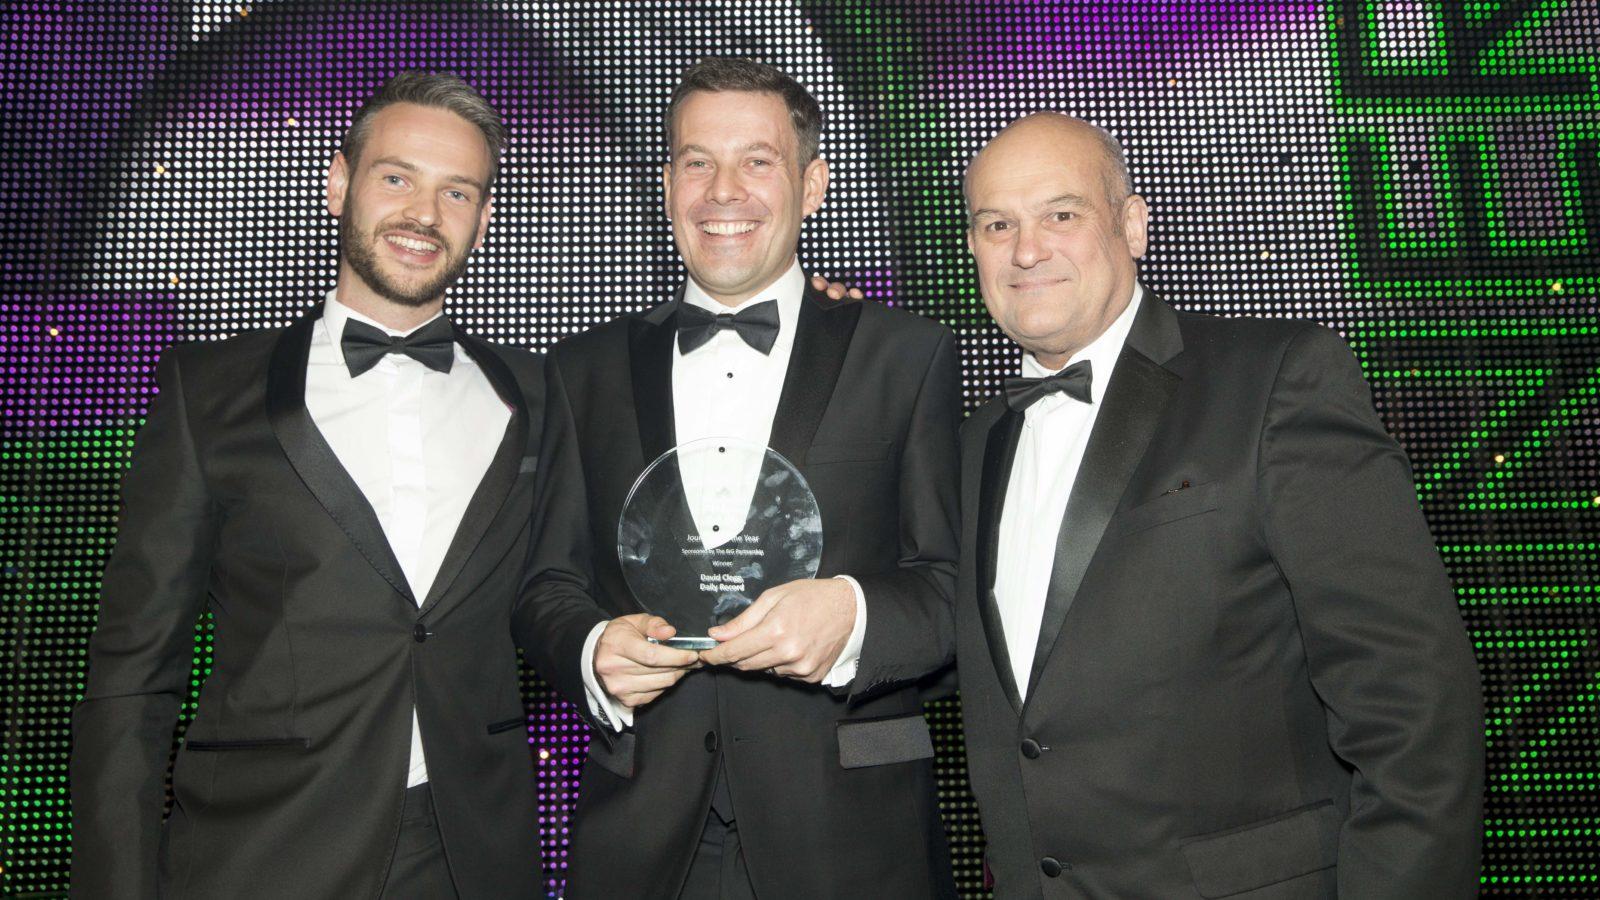 Journalist of the Year Sponsored by The BIG Partnership - @BIGPartnership Winner David Clegg, Daily Record